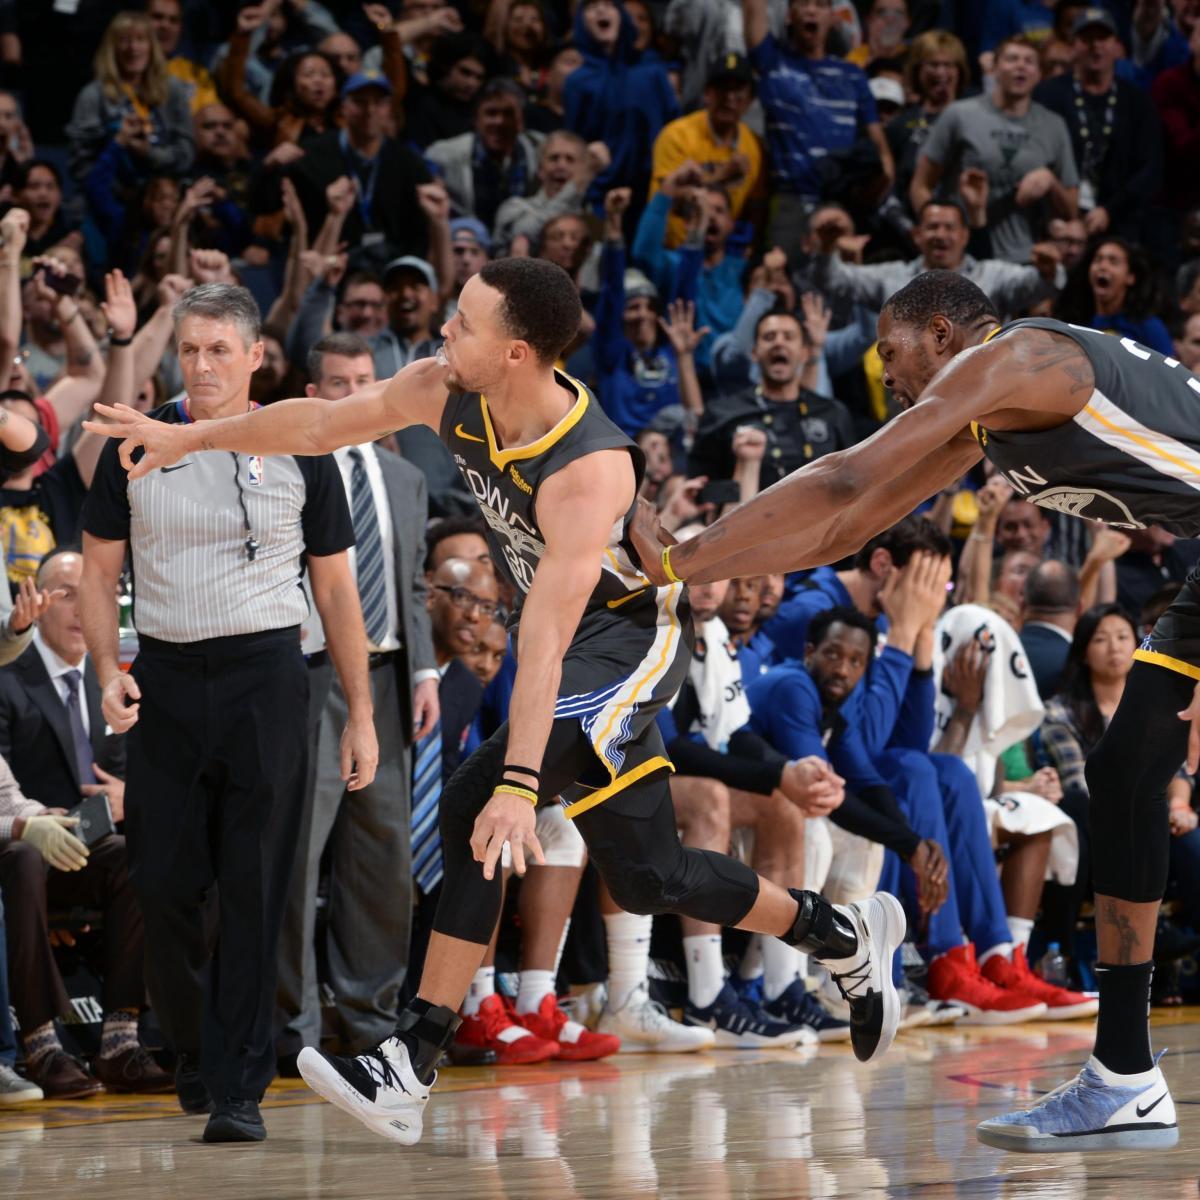 Warriors Movie Clips: Video: Warriors' Stephen Curry Drains Game-Winning Layup